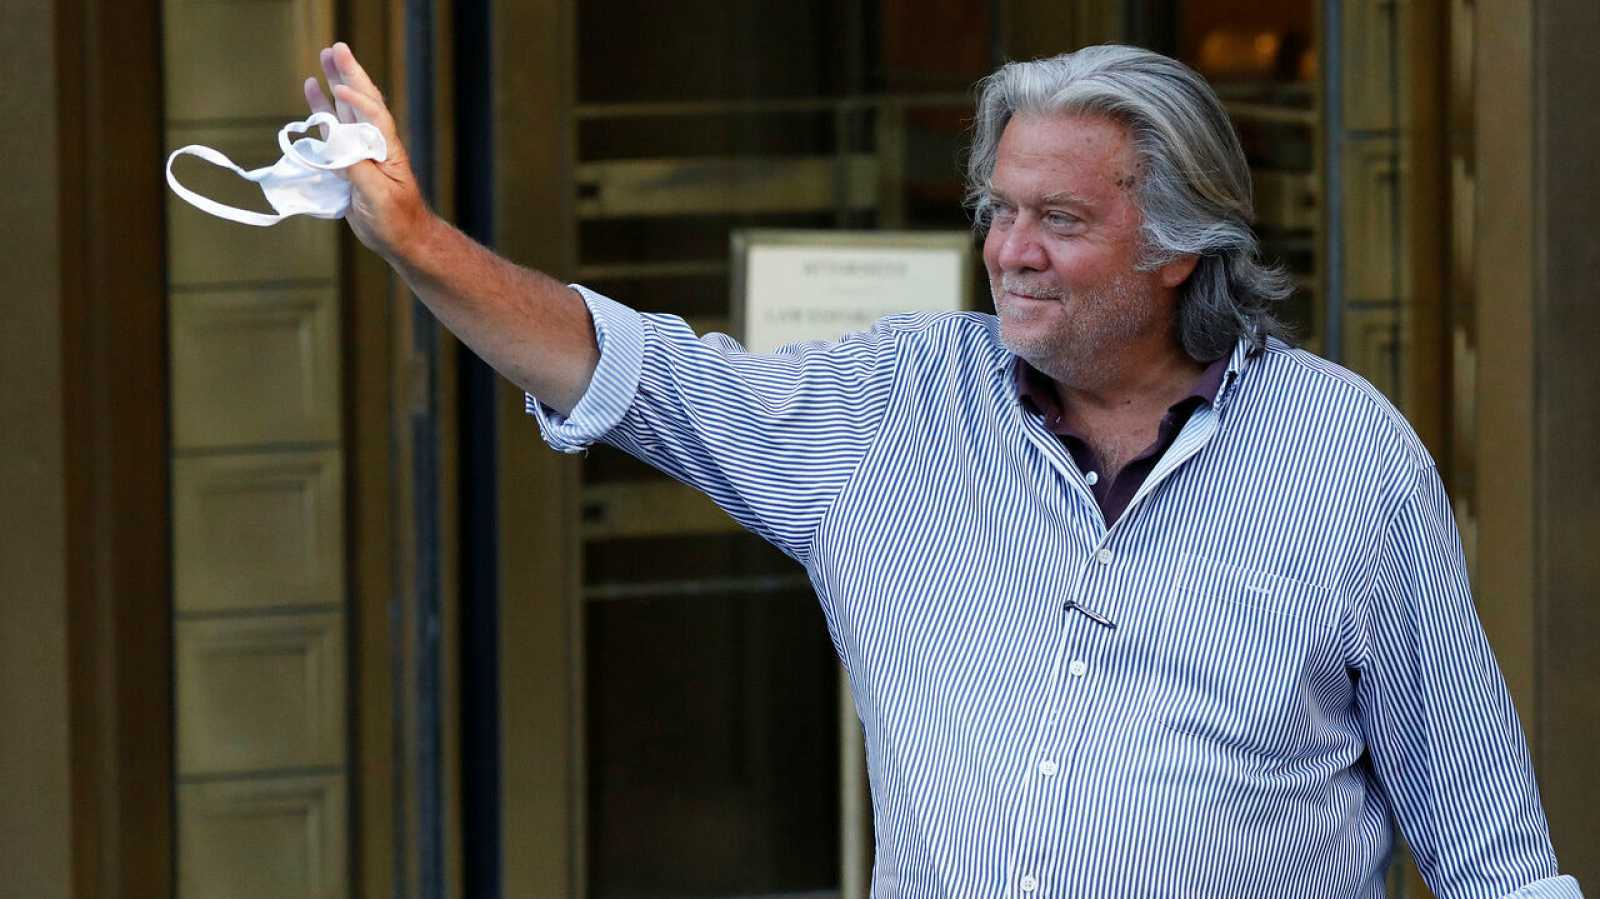 El exestratega jefe de la Casa Blanca, Steve Bannon, sale del Tribunal Federal de Manhattan.